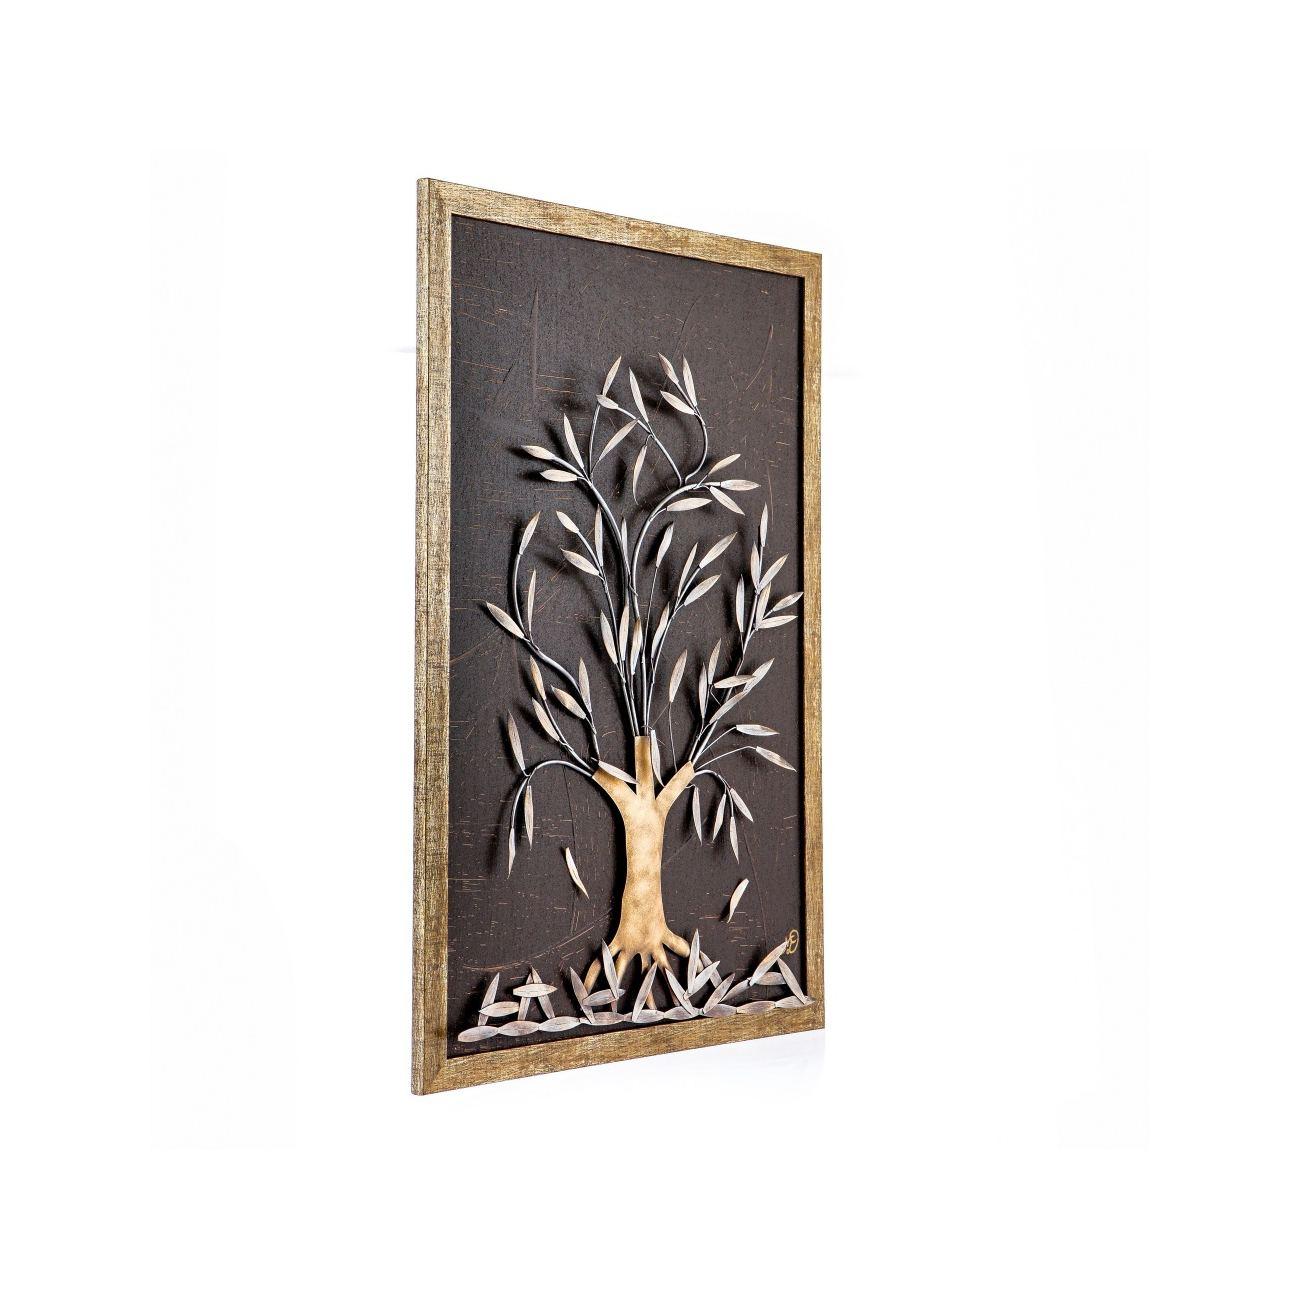 Olive Tree, 3D Handmade Wood & Metal Wall Art Framed Decor, 25\